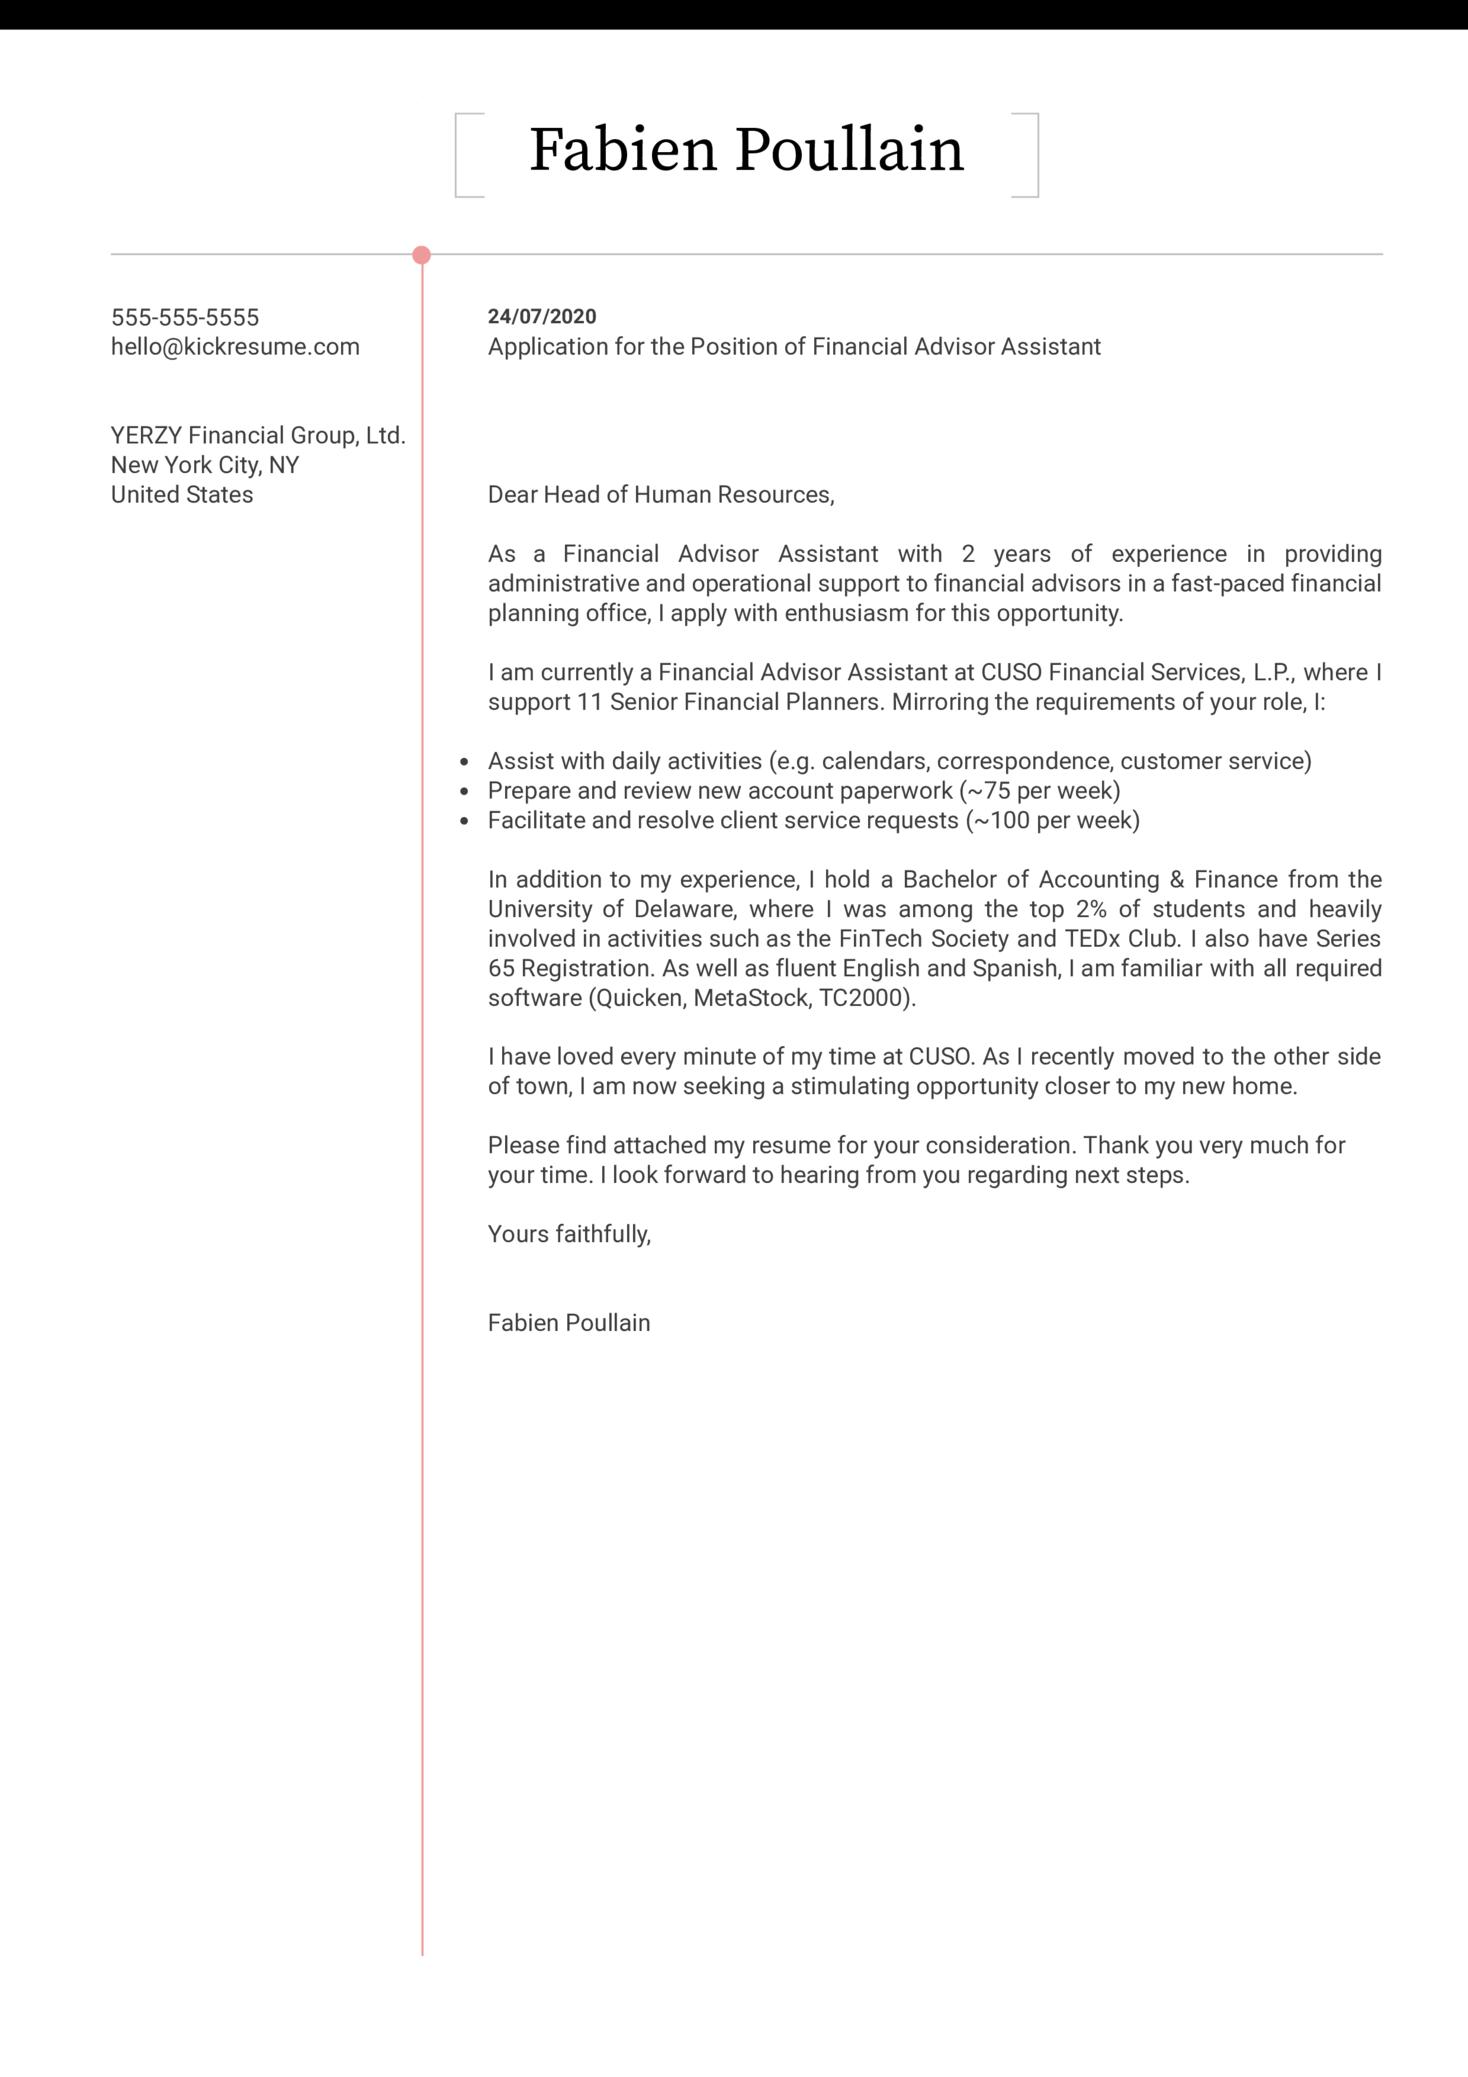 Financial Advisor Assistant Cover Letter Sample